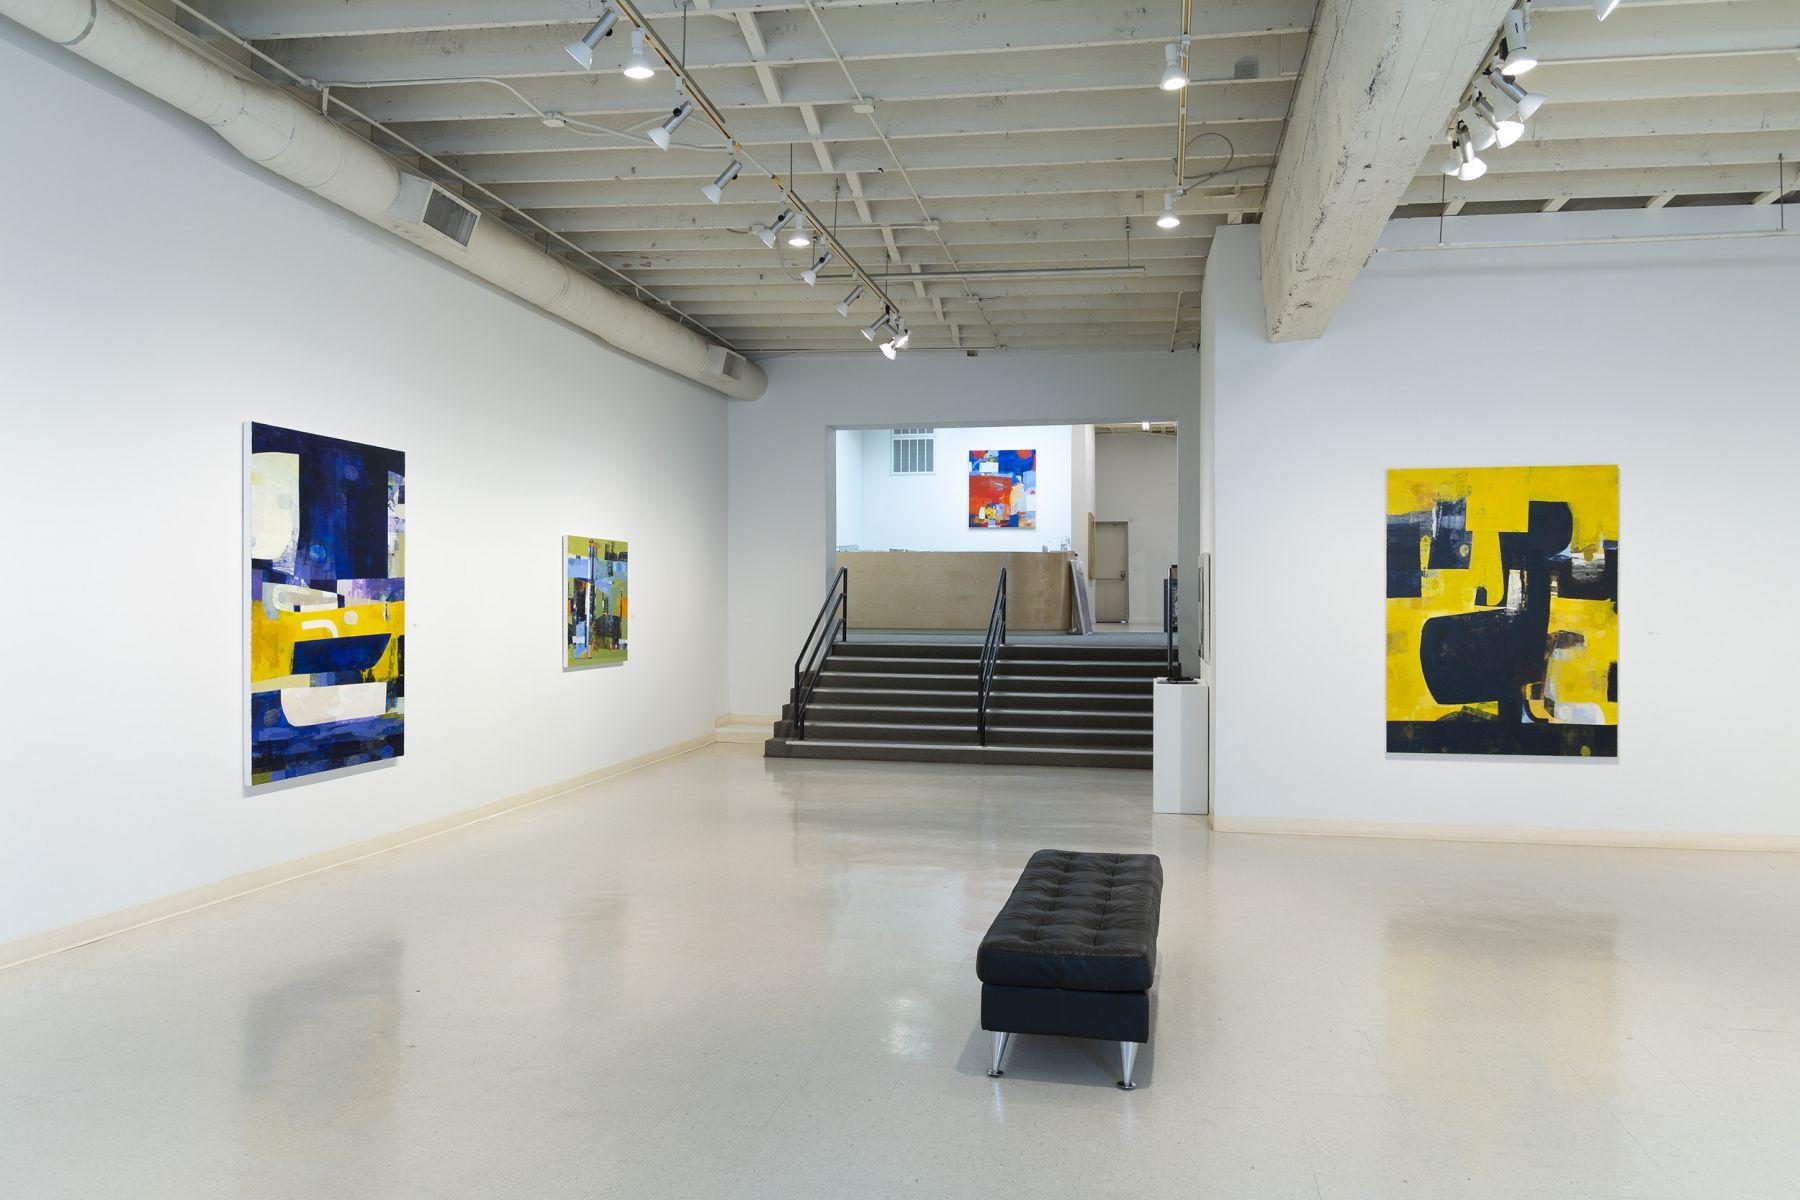 G. Lewis Clevenger - Minimis/Maximus - June 2019 - Installation View 02